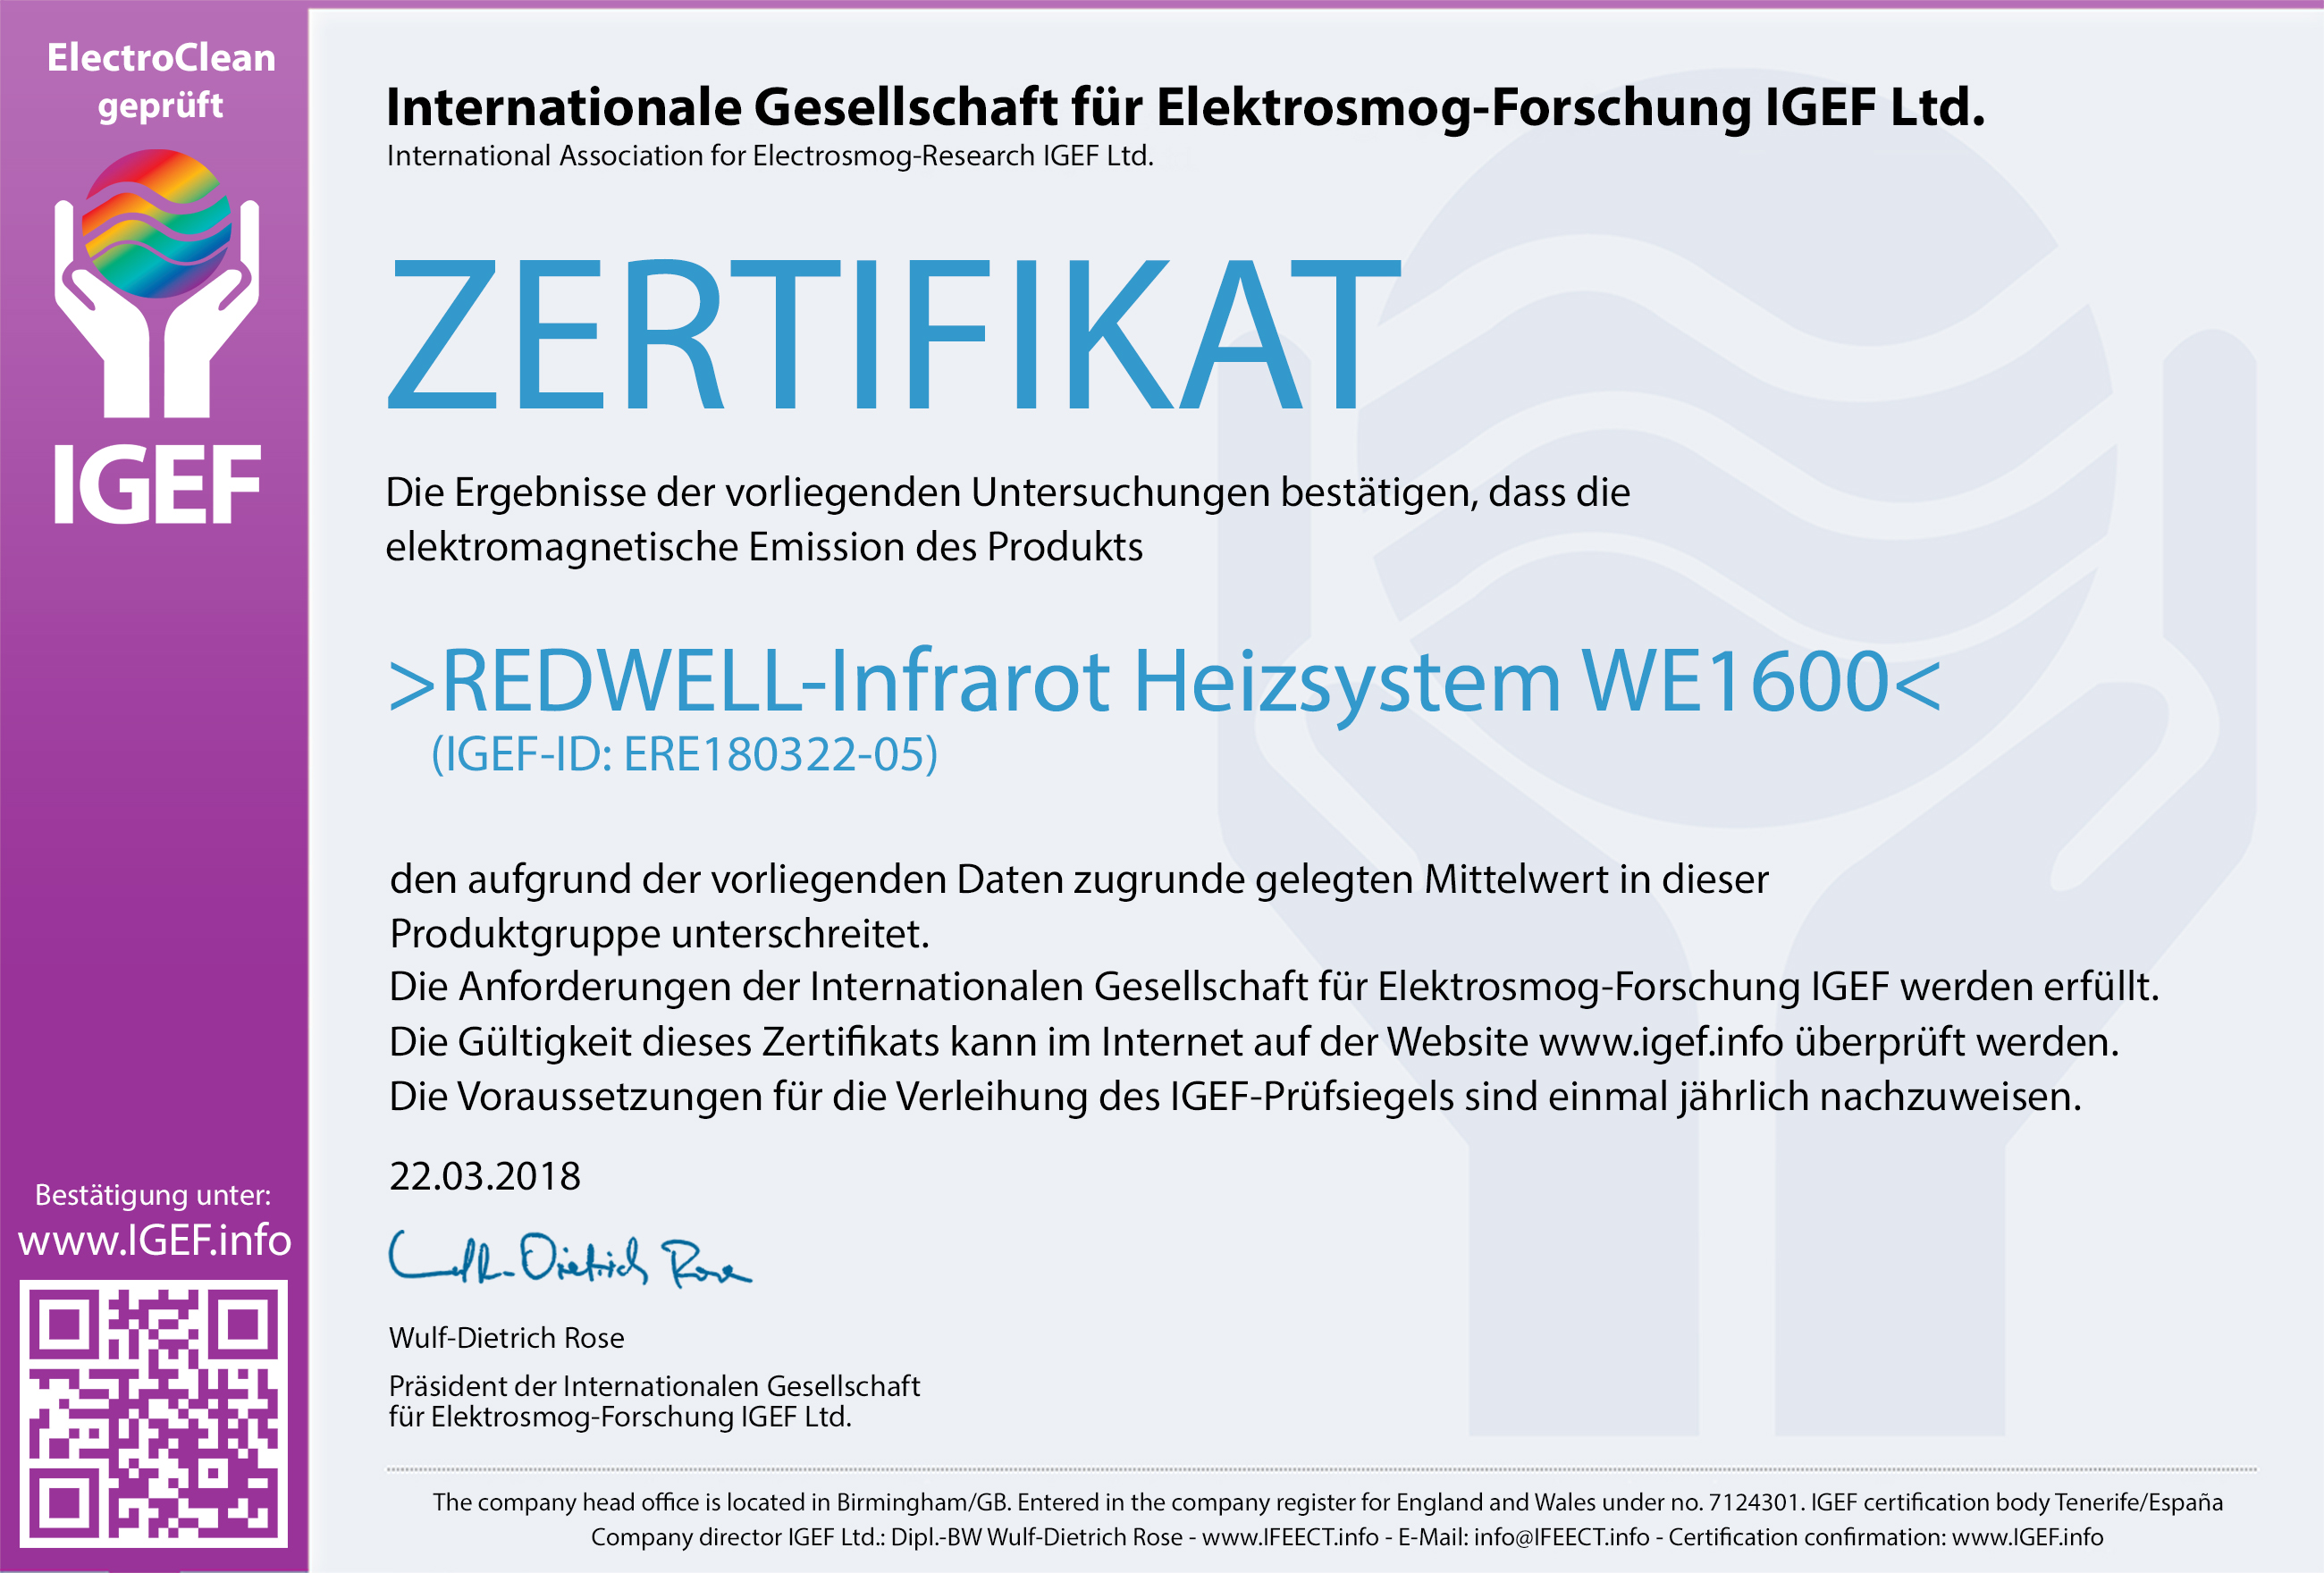 IGEF-Zertifikat-ERE4-DE-18